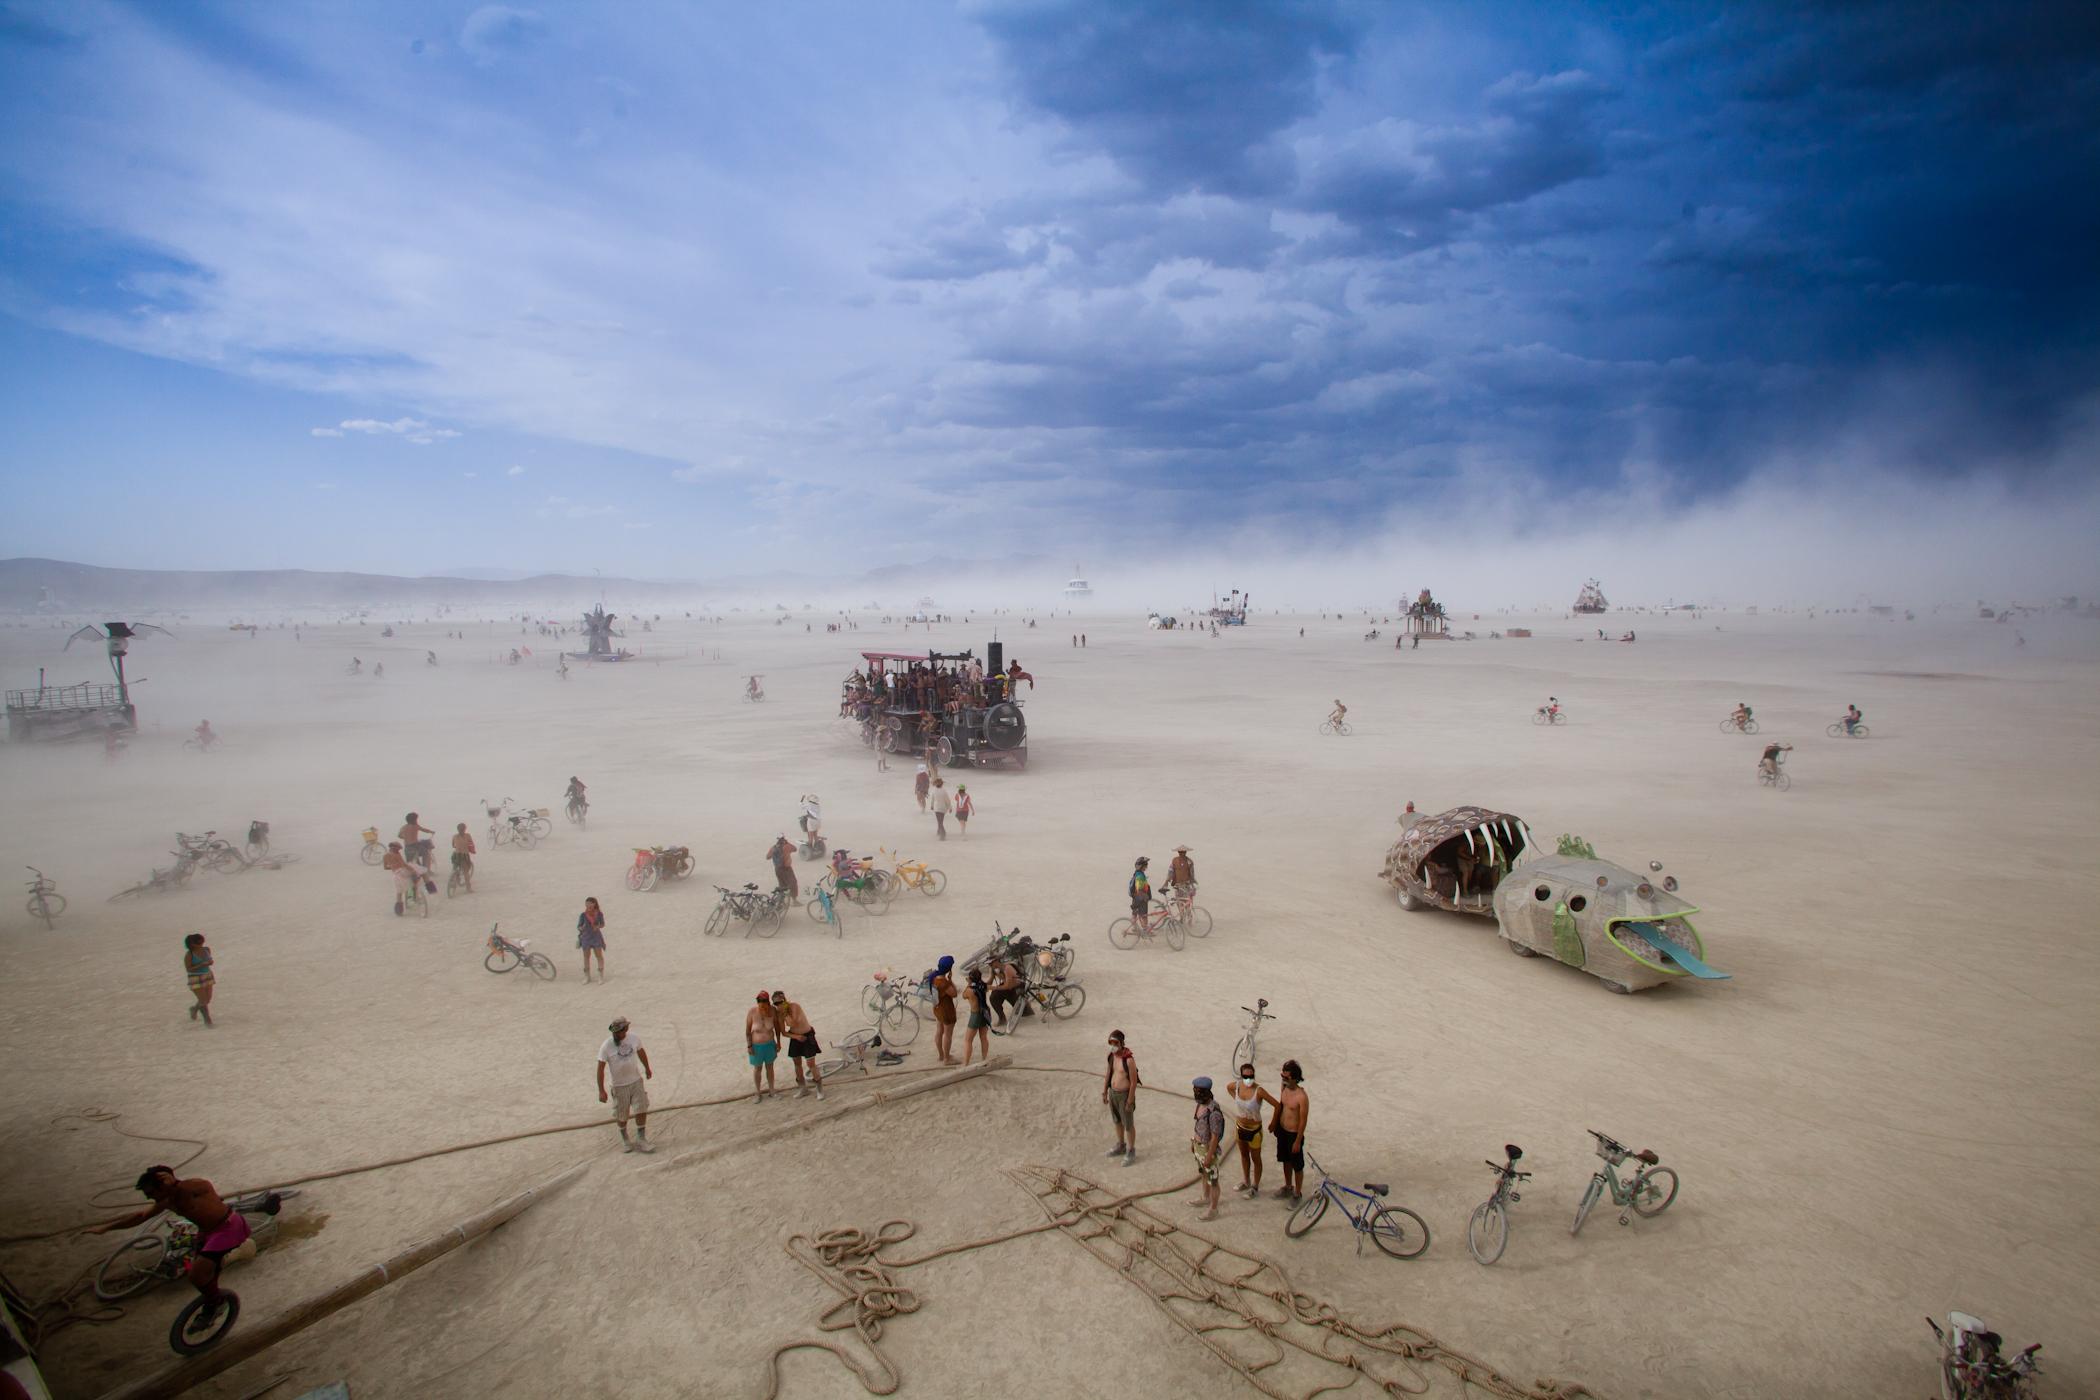 Burning Man 2012 in 21 photos